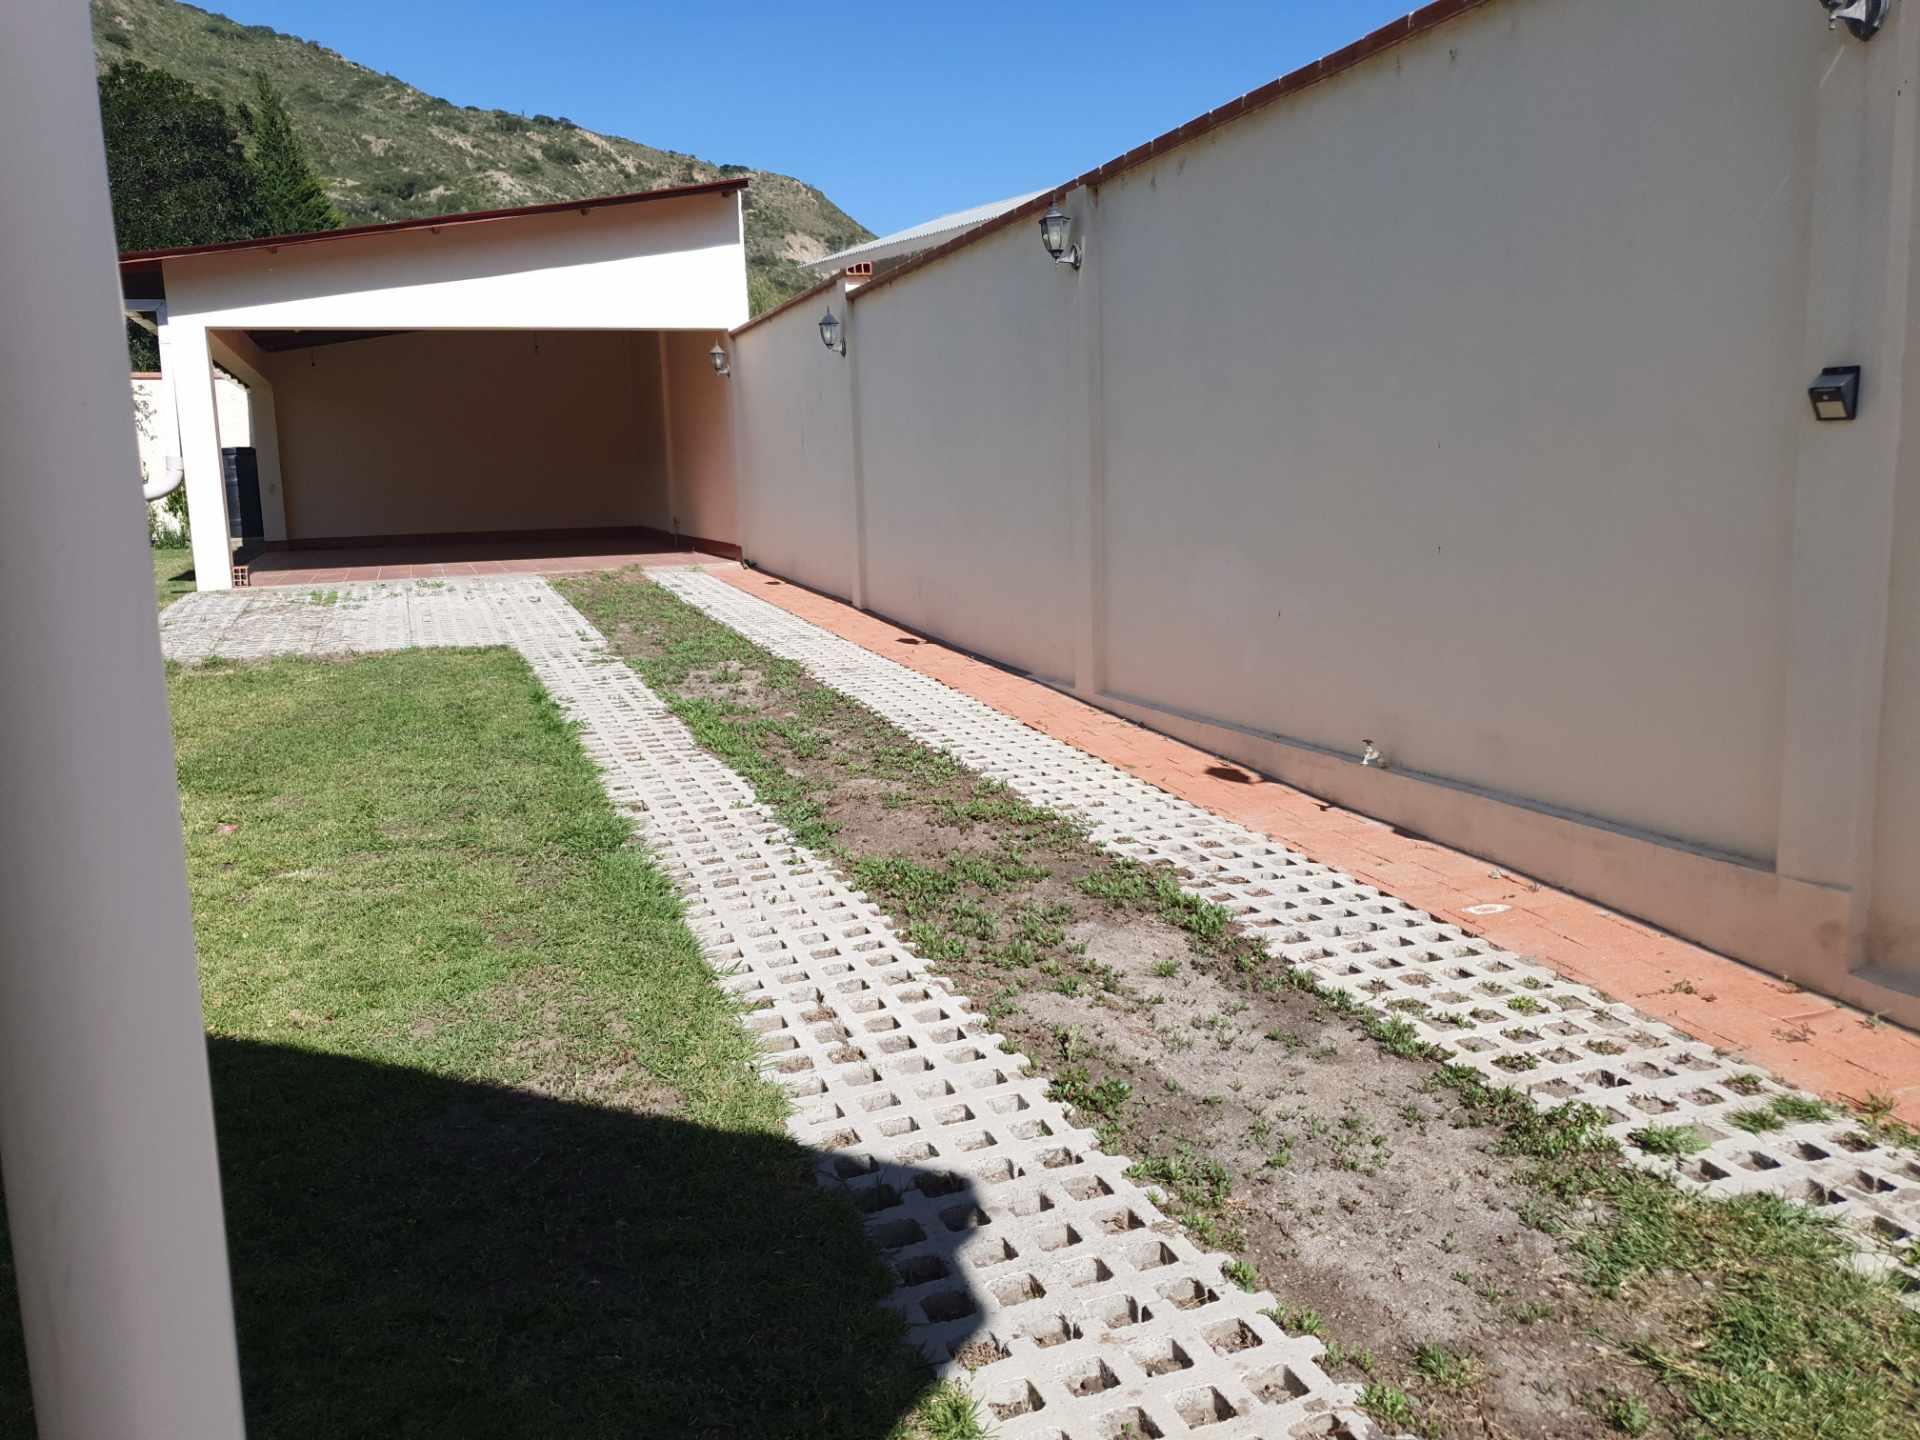 Casa en Venta Zona Sur, Huajchilla. Urbanizacion Bartos. Foto 4